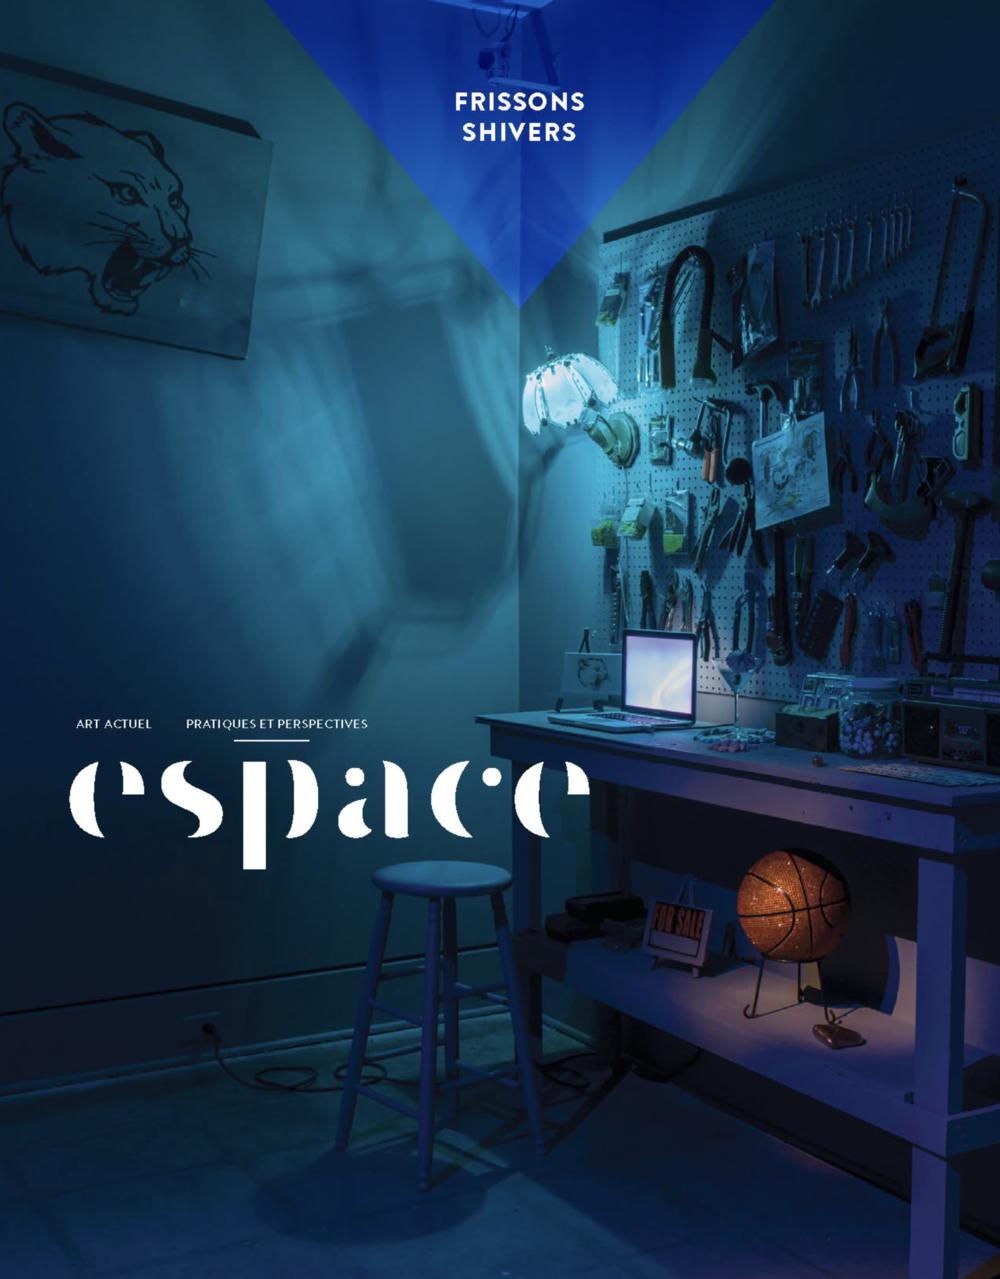 Espace Magazine: Frissons Shivers, No. 117, Fall 2017